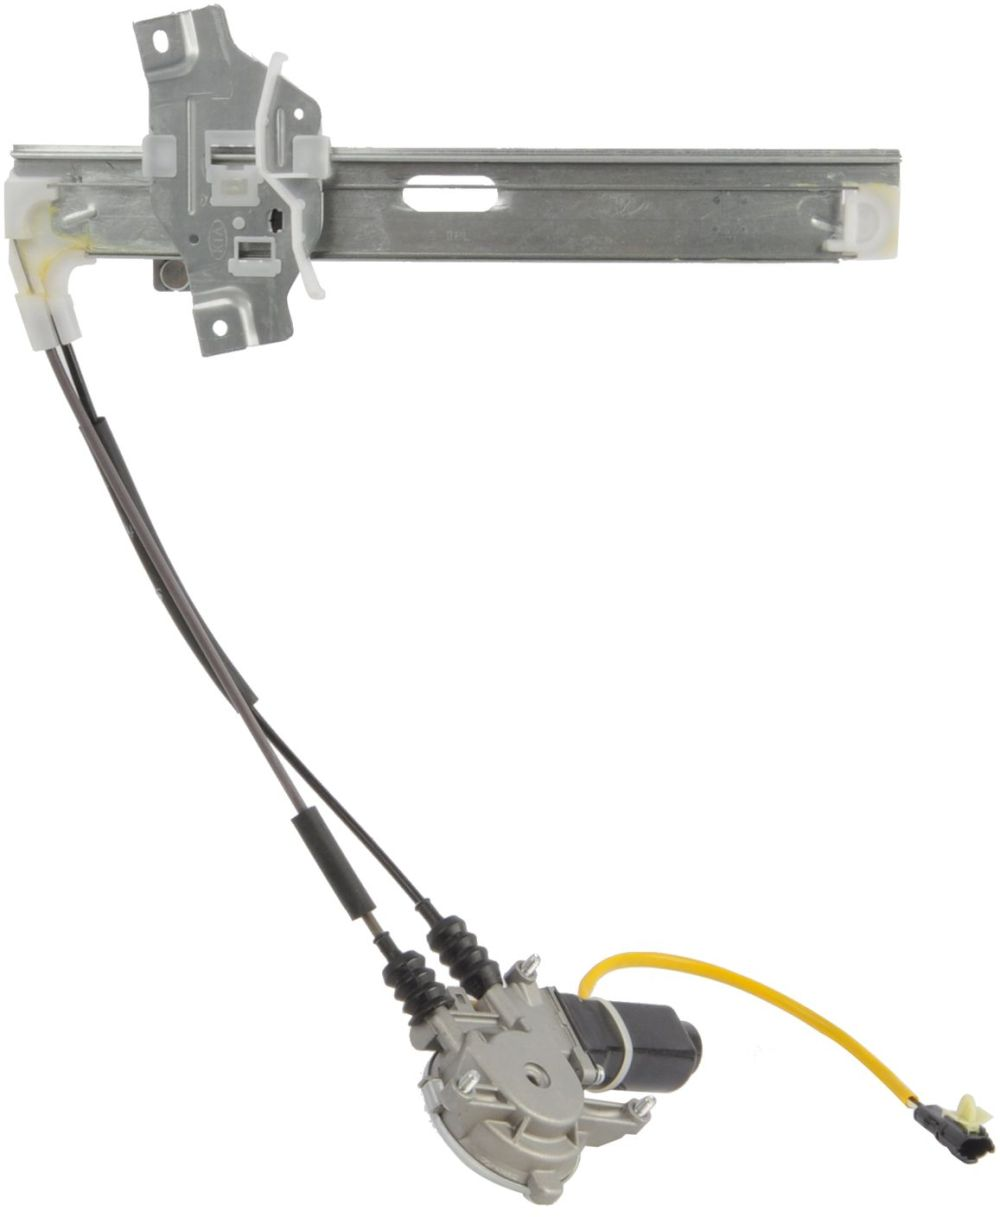 medium resolution of 2001 kia sephia power window motor and regulator assembly a1 82 4522ar